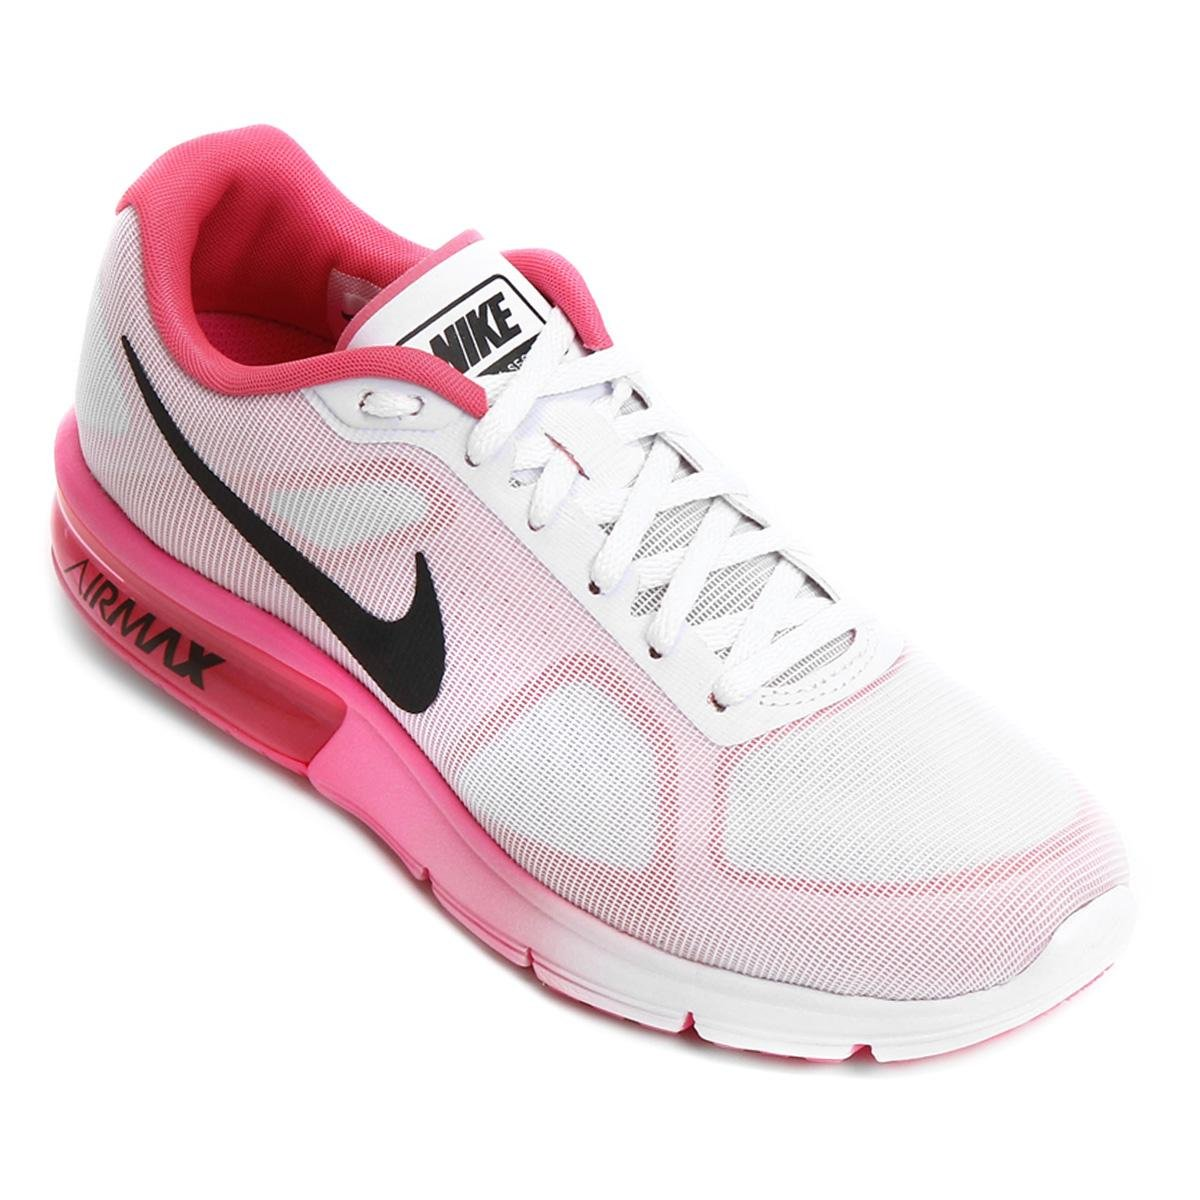 f85c64e48 Tênis Nike Air Max Sequent Feminino | Loja do Inter